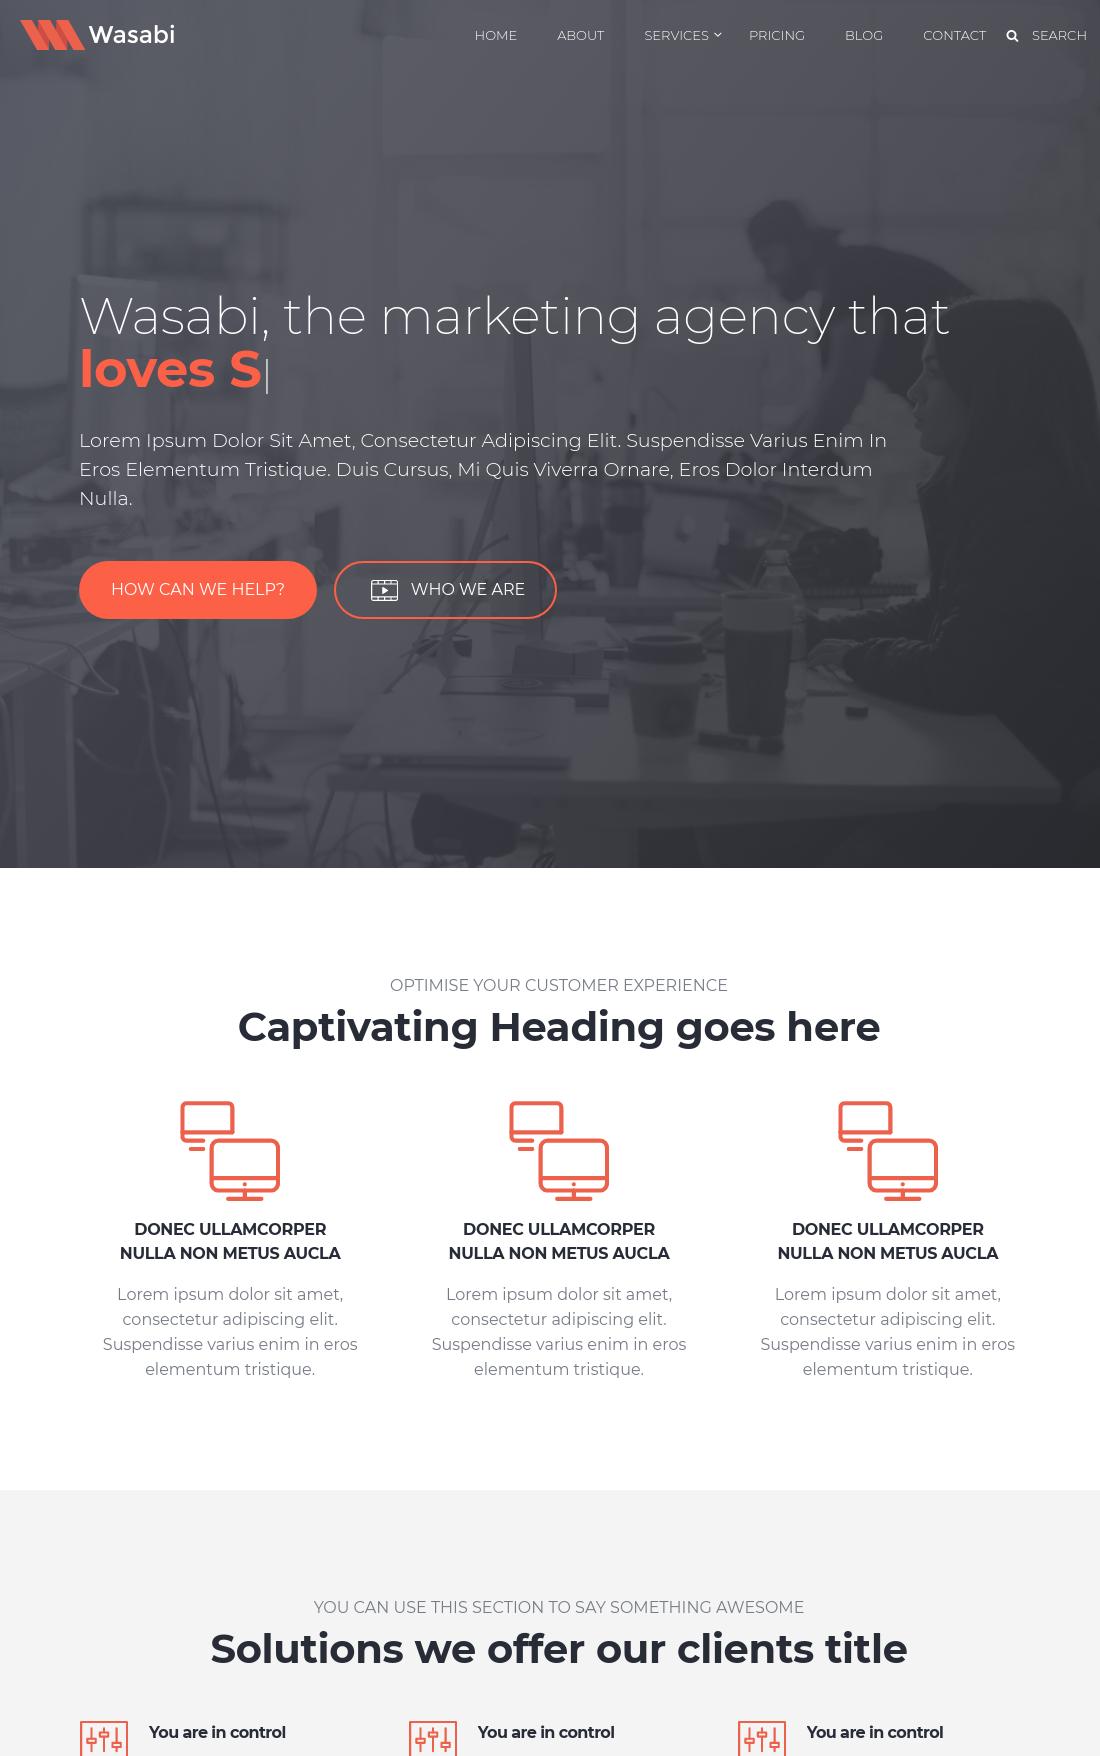 WASABI Homepage Template | HubSpot